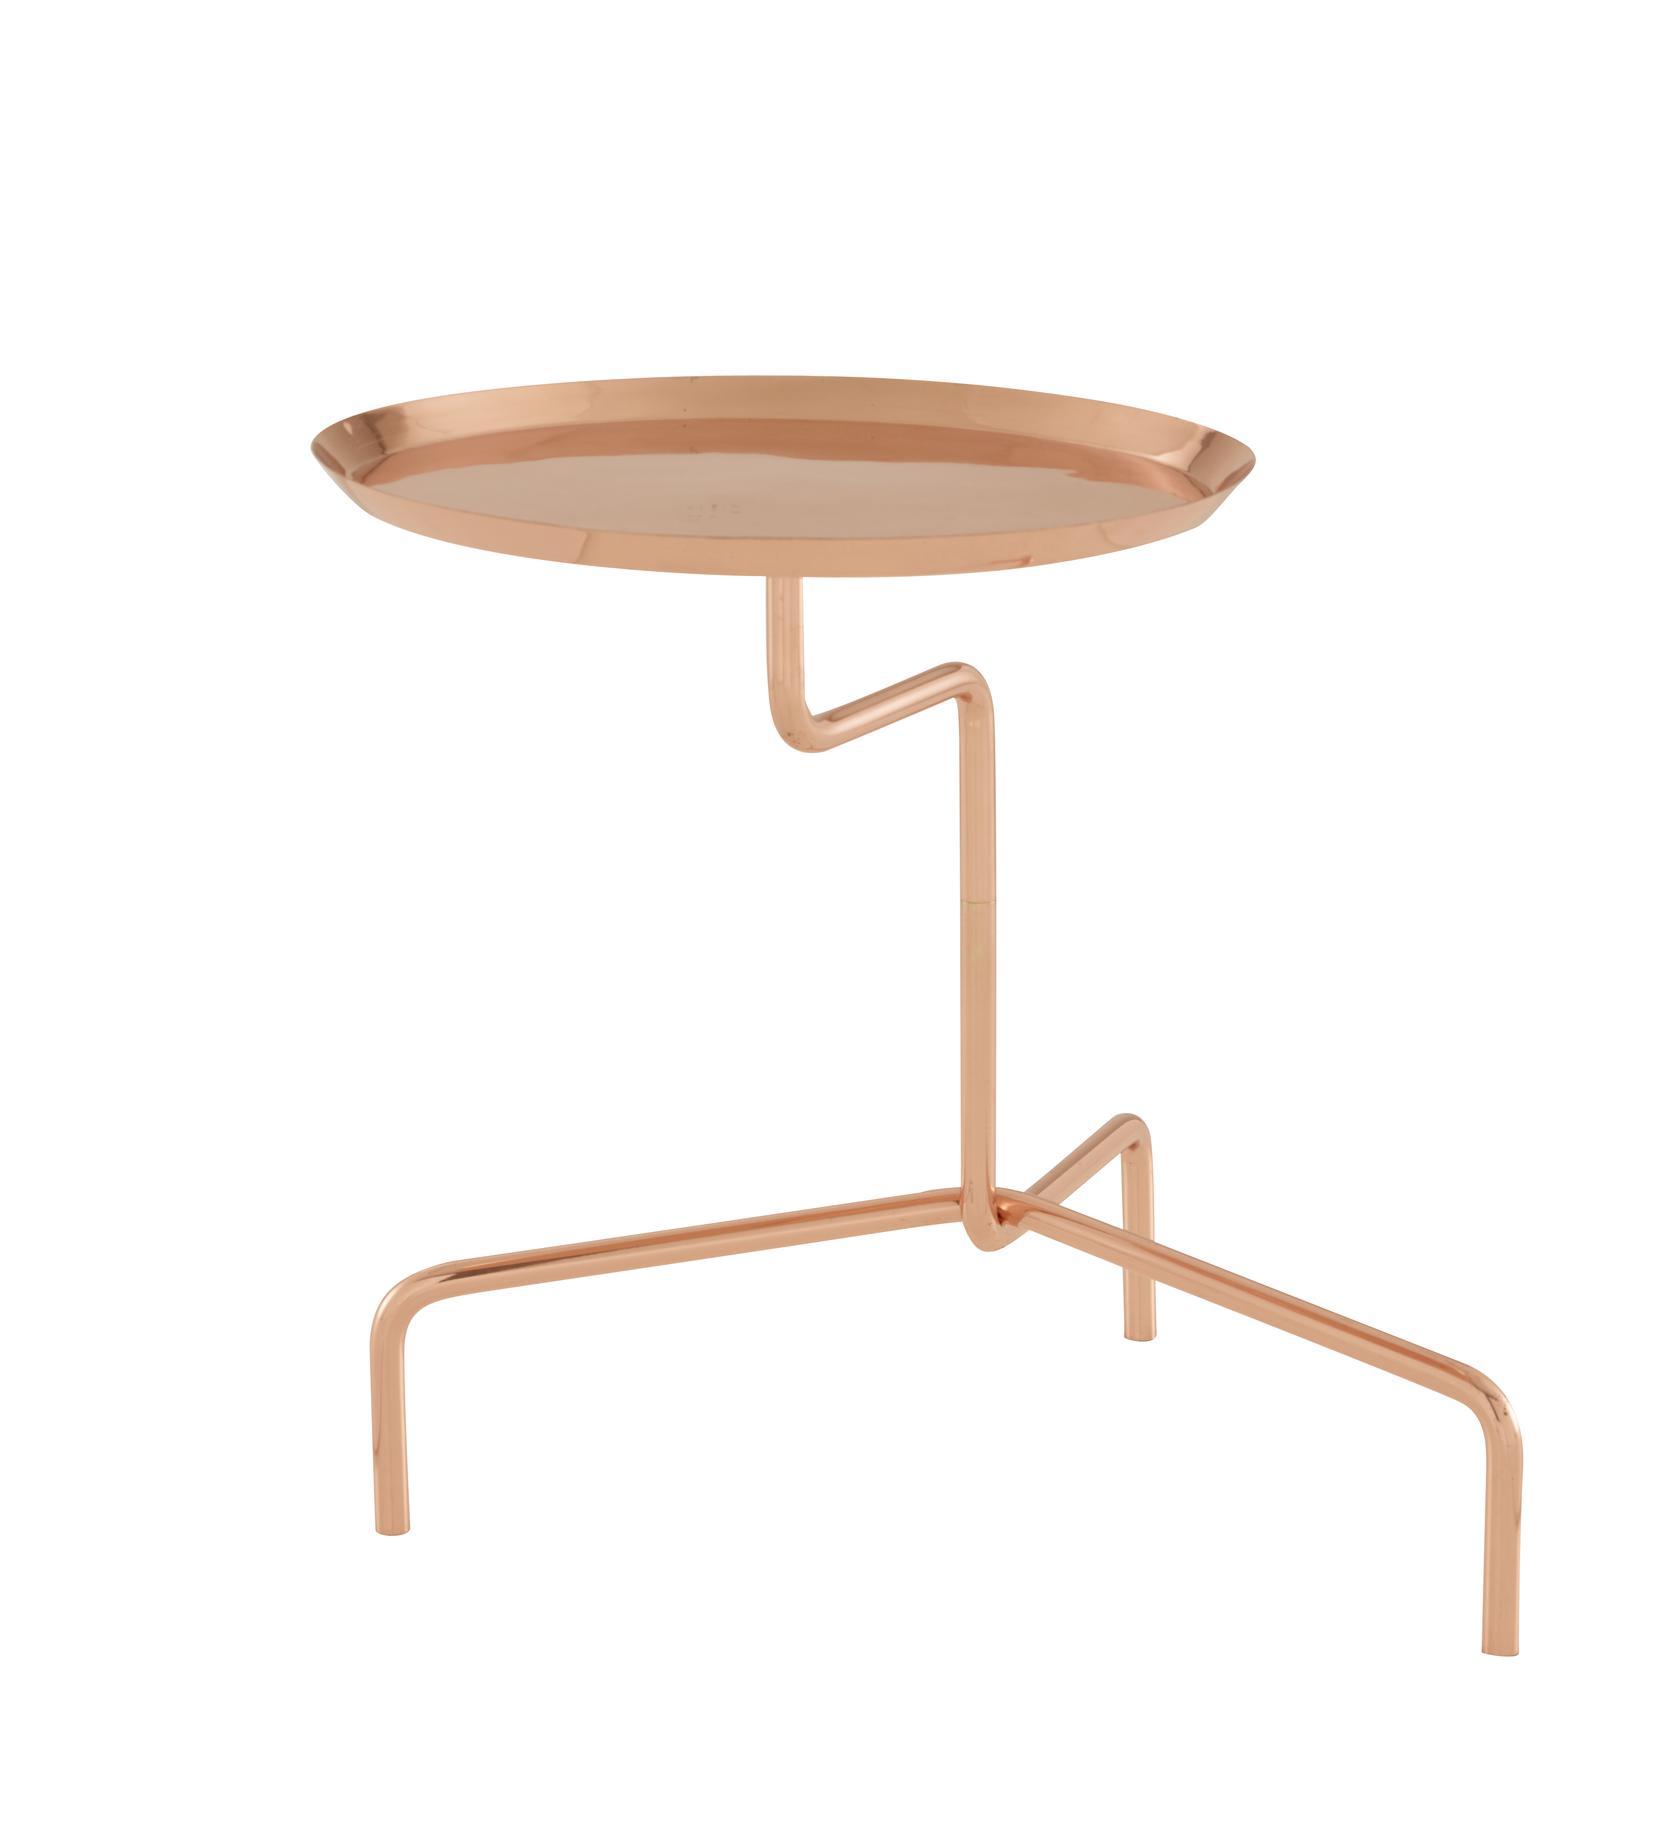 Phobos occasional tables designer marie christine - Ligne roset side table ...